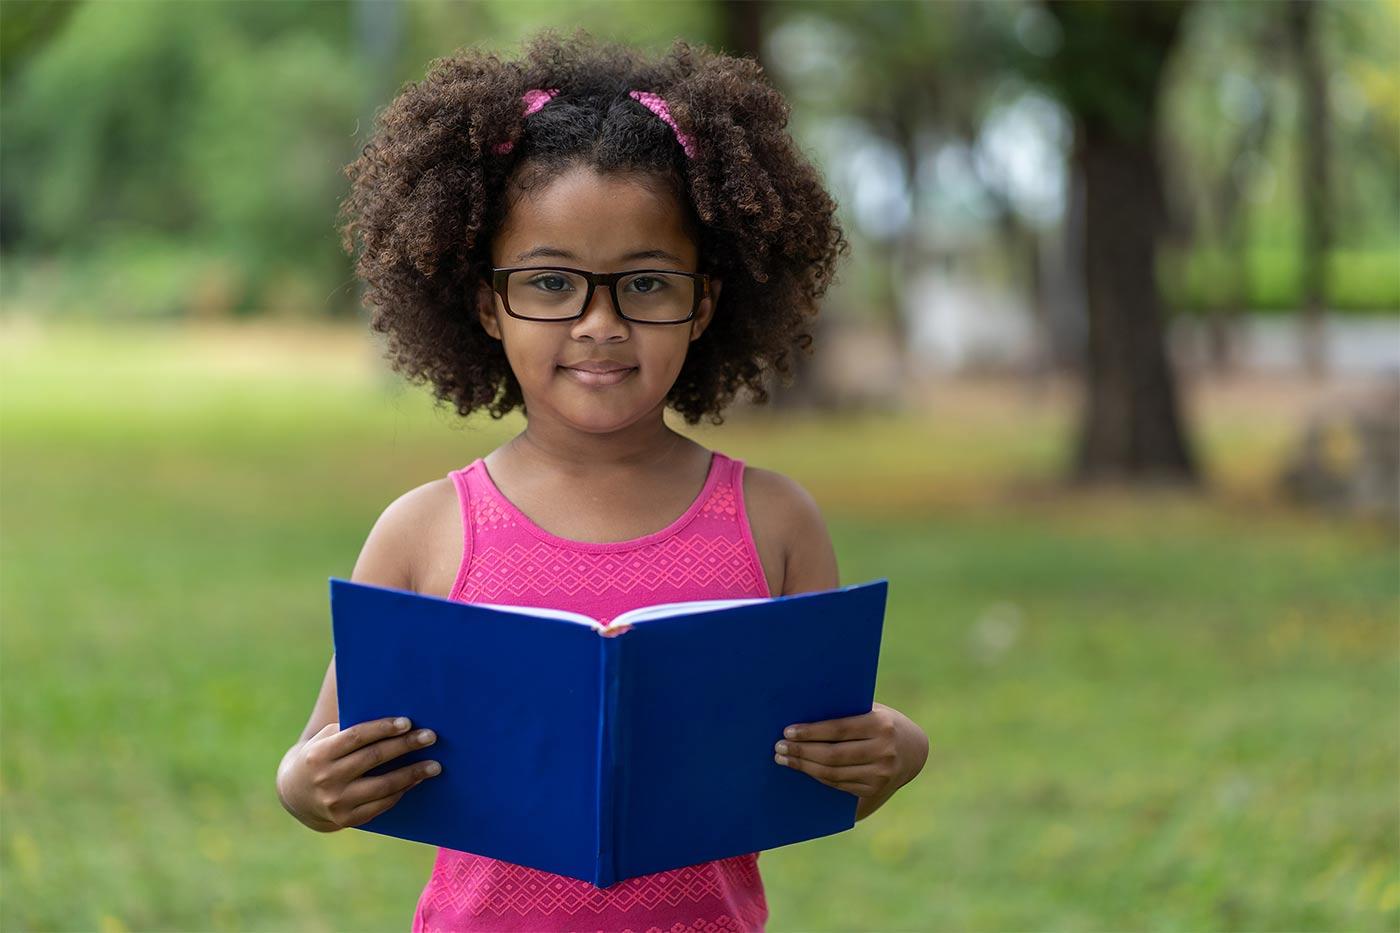 little girl reading a book outdoors